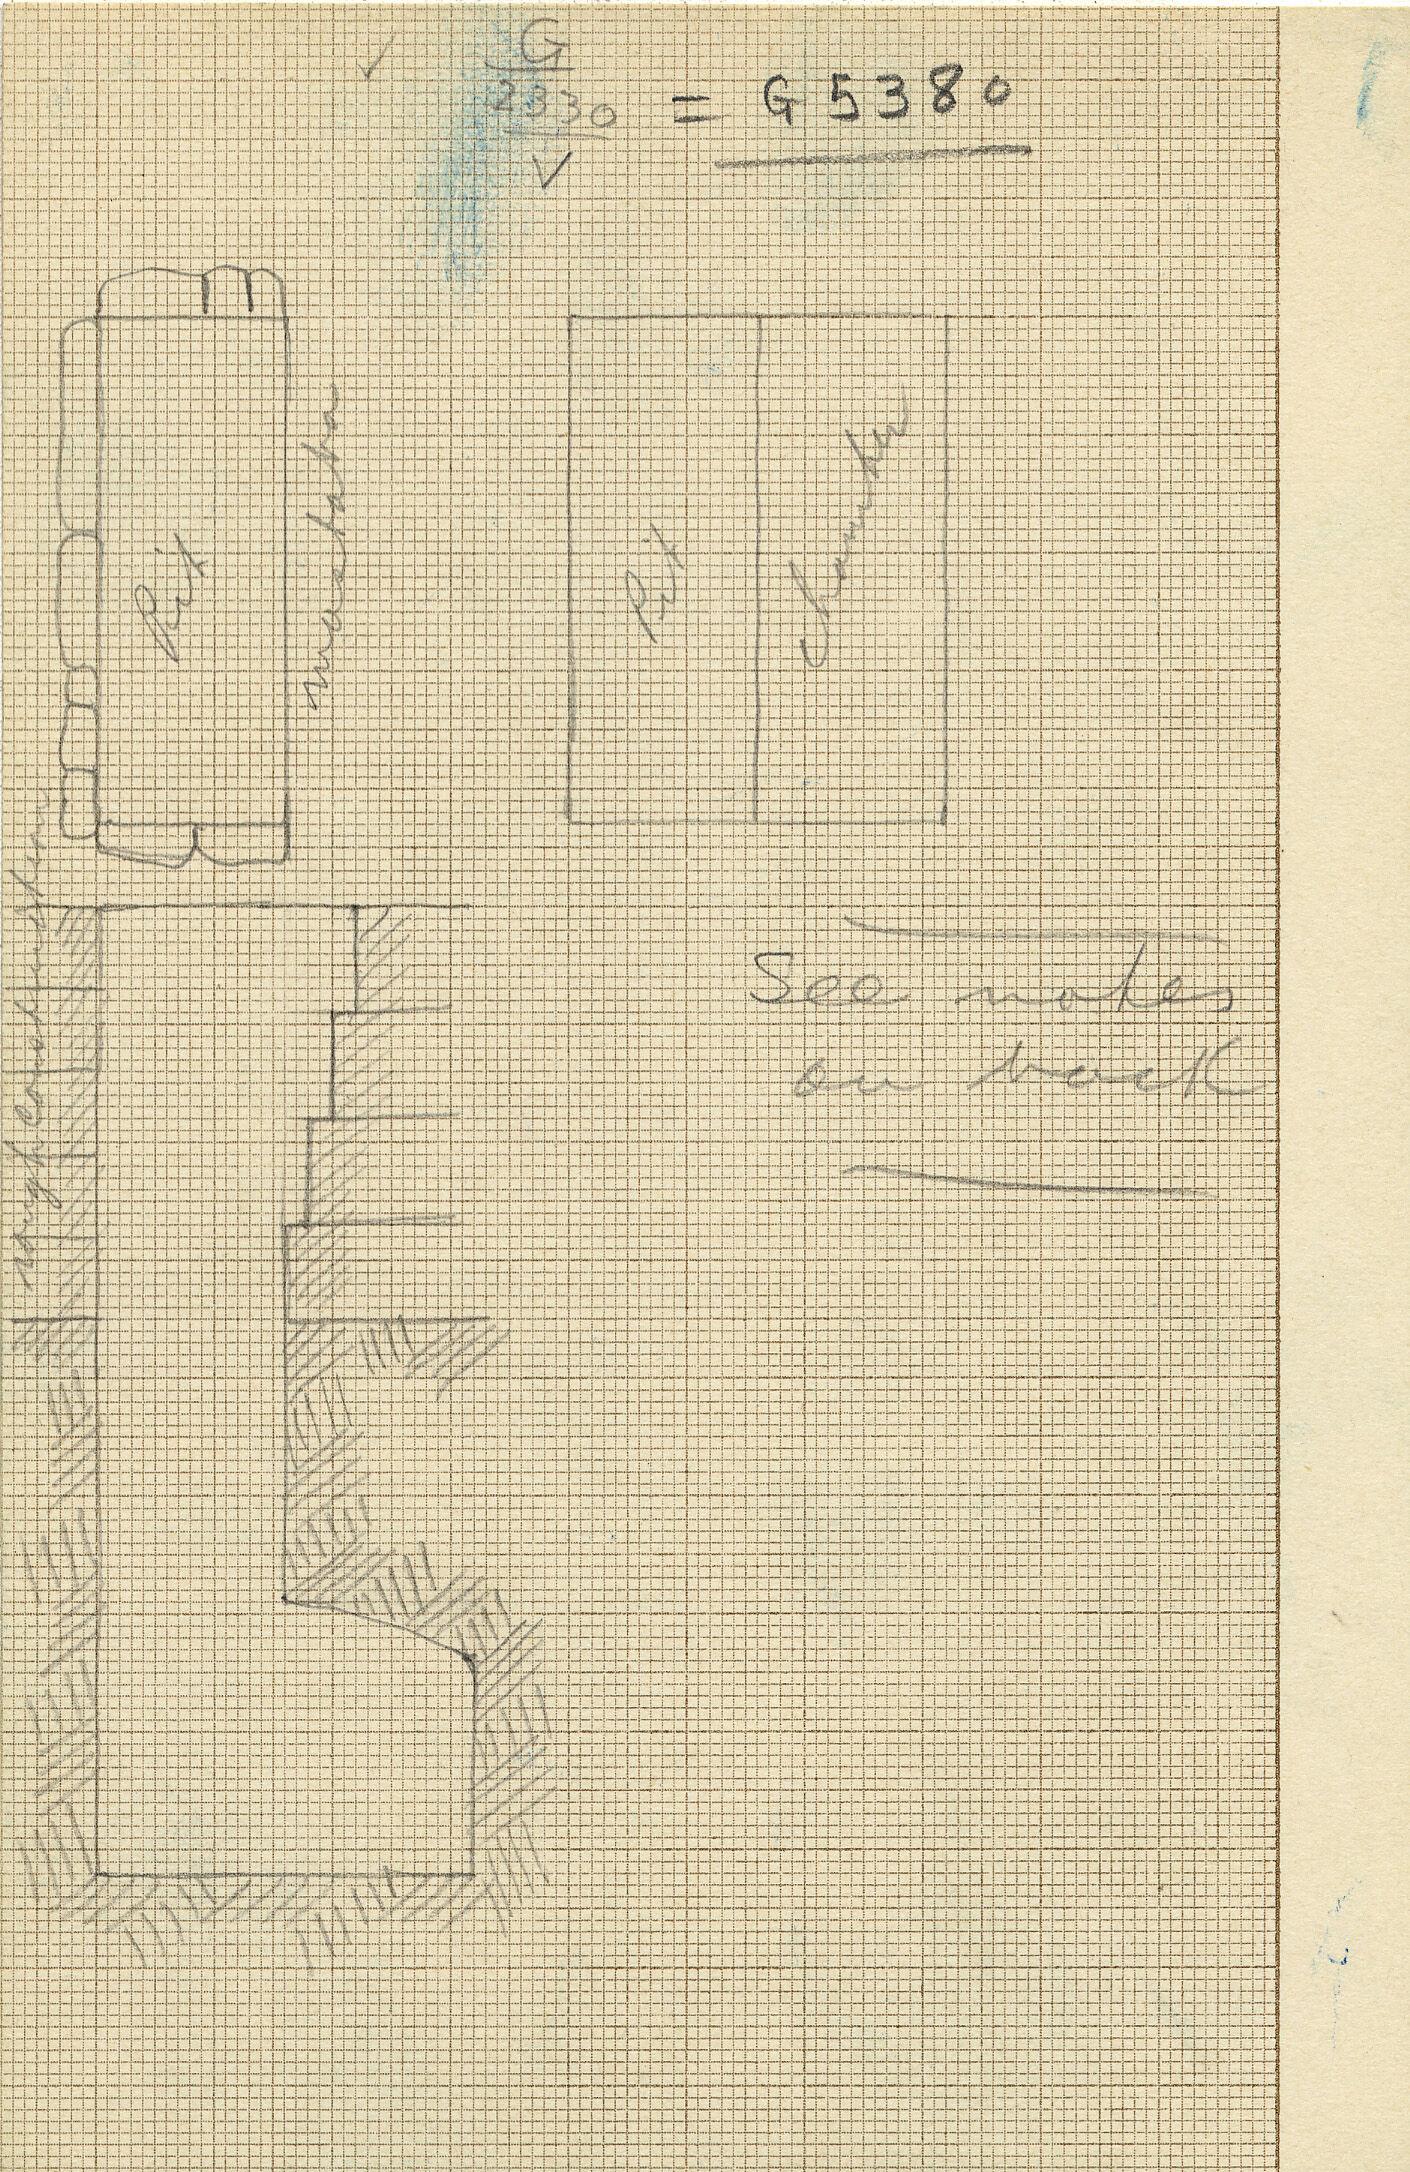 Maps and plans: G 2330 = G 5380, Shaft V